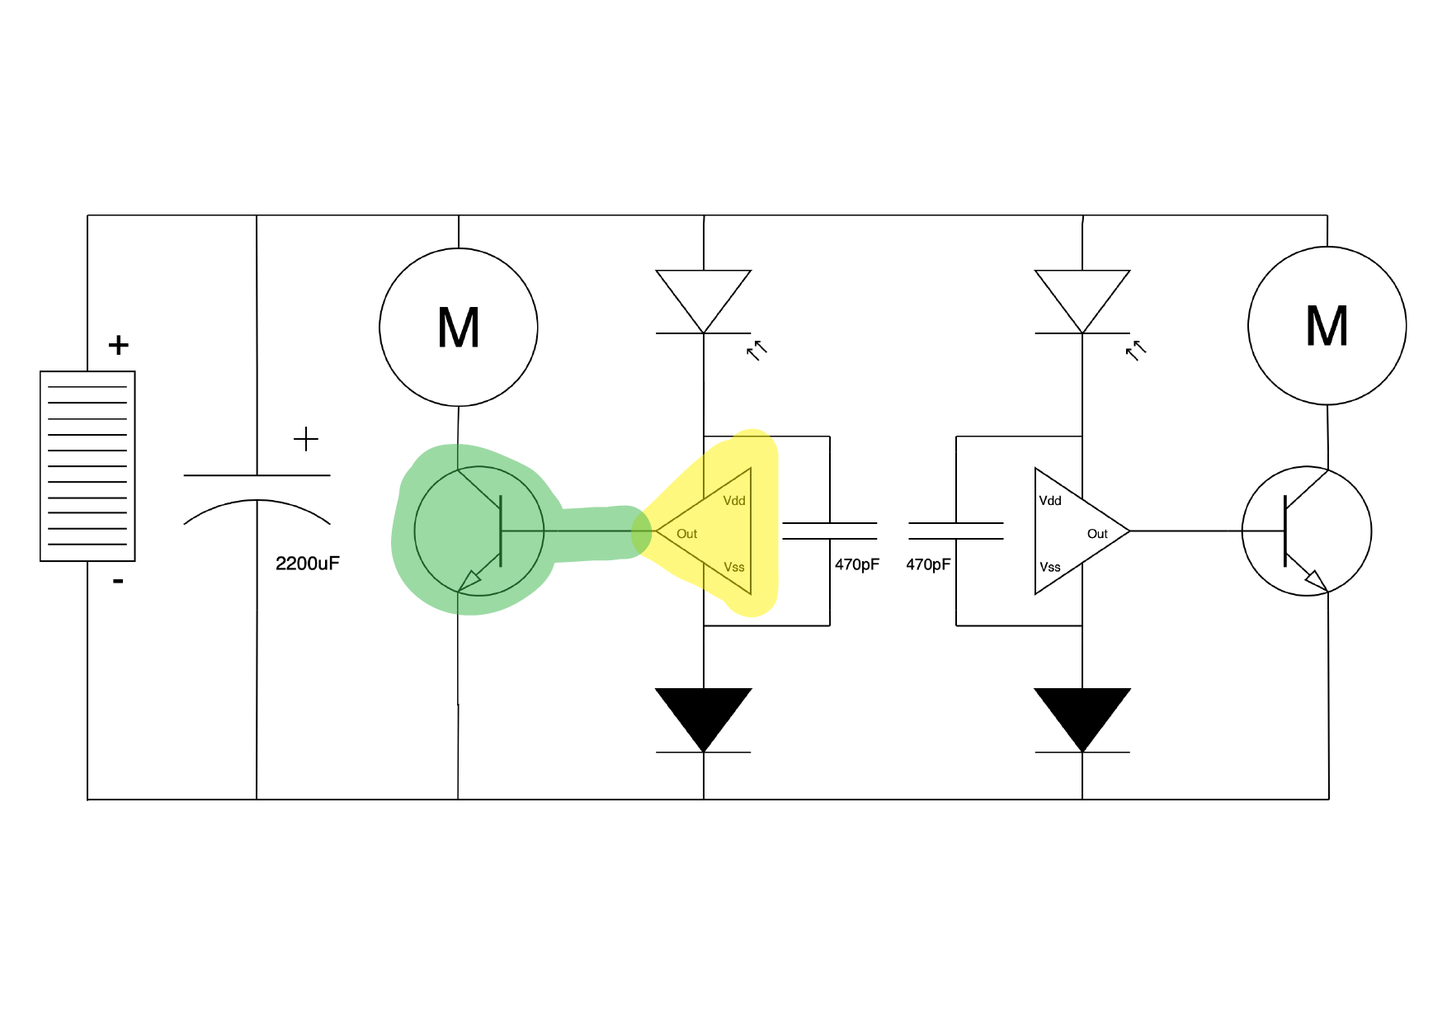 Freeforming the Circuit 2: